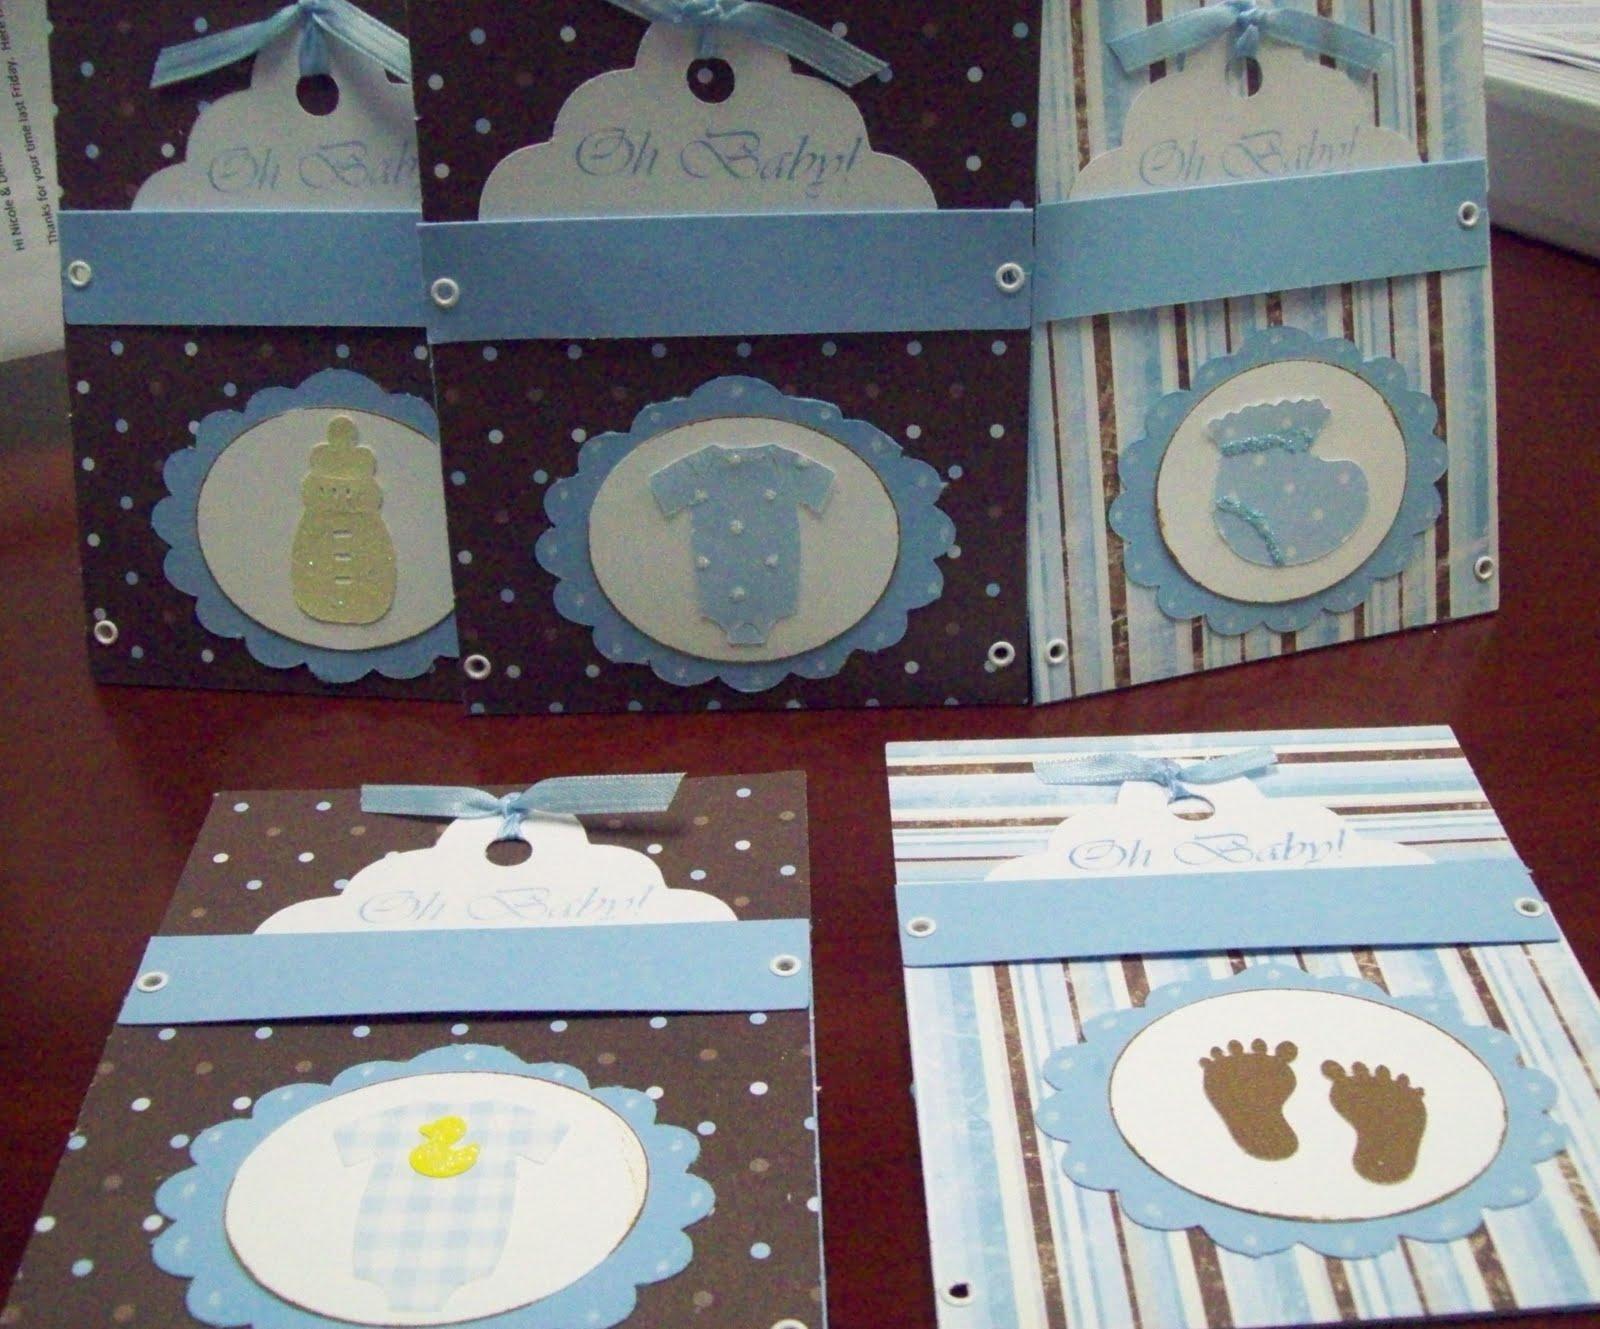 Baby Shower Food Ideas: Baby Shower Ideas Using Cricut